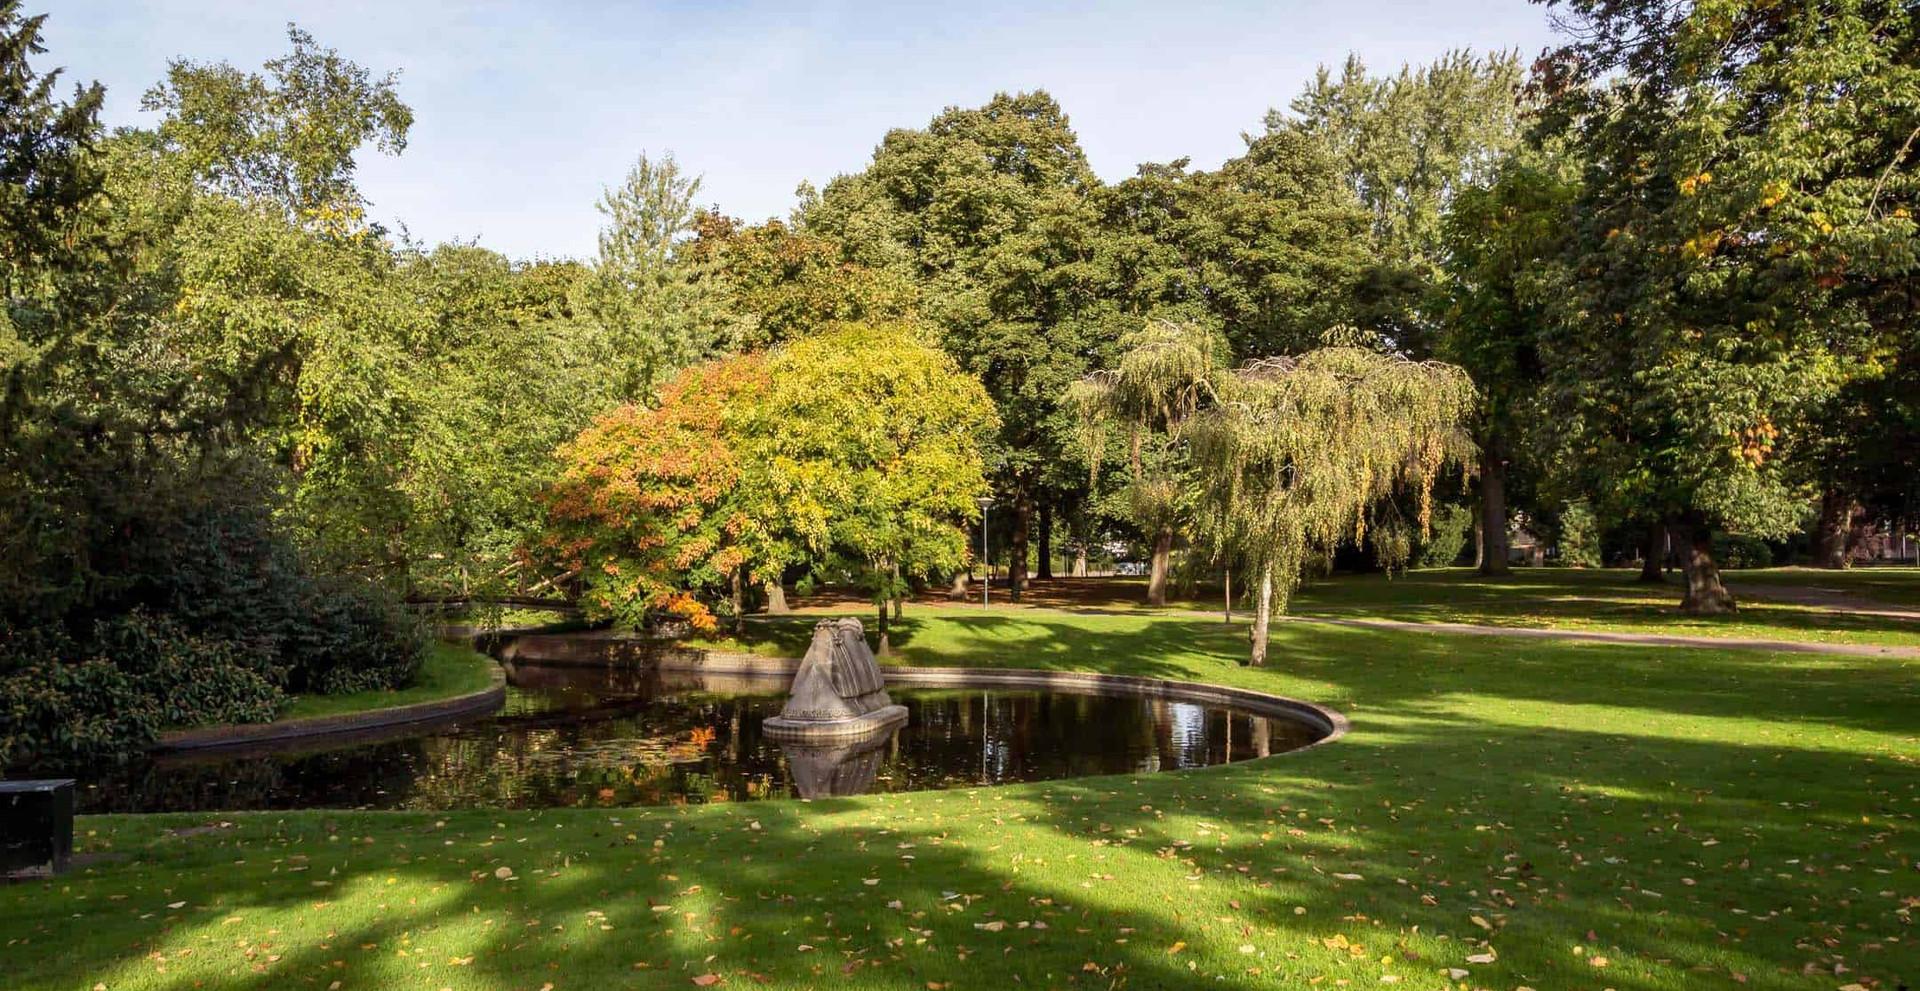 Wilhelminapark-11-46.jpg